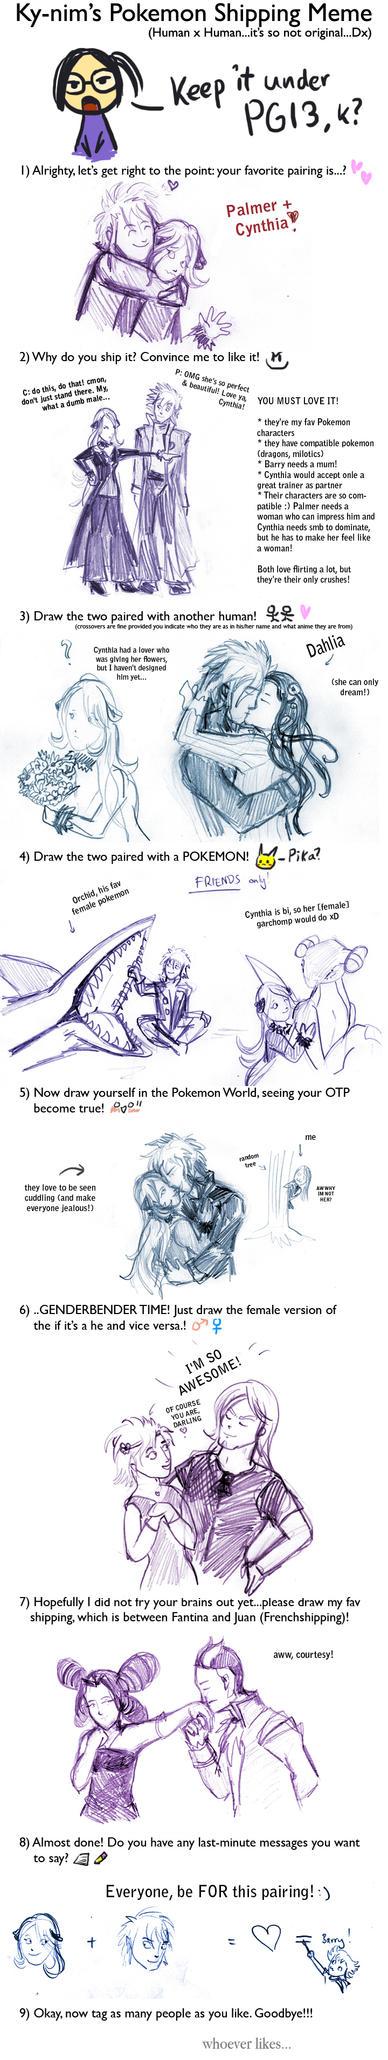 Pokemon shipping meme - Palmer + Cynthia by WielkiDuchII